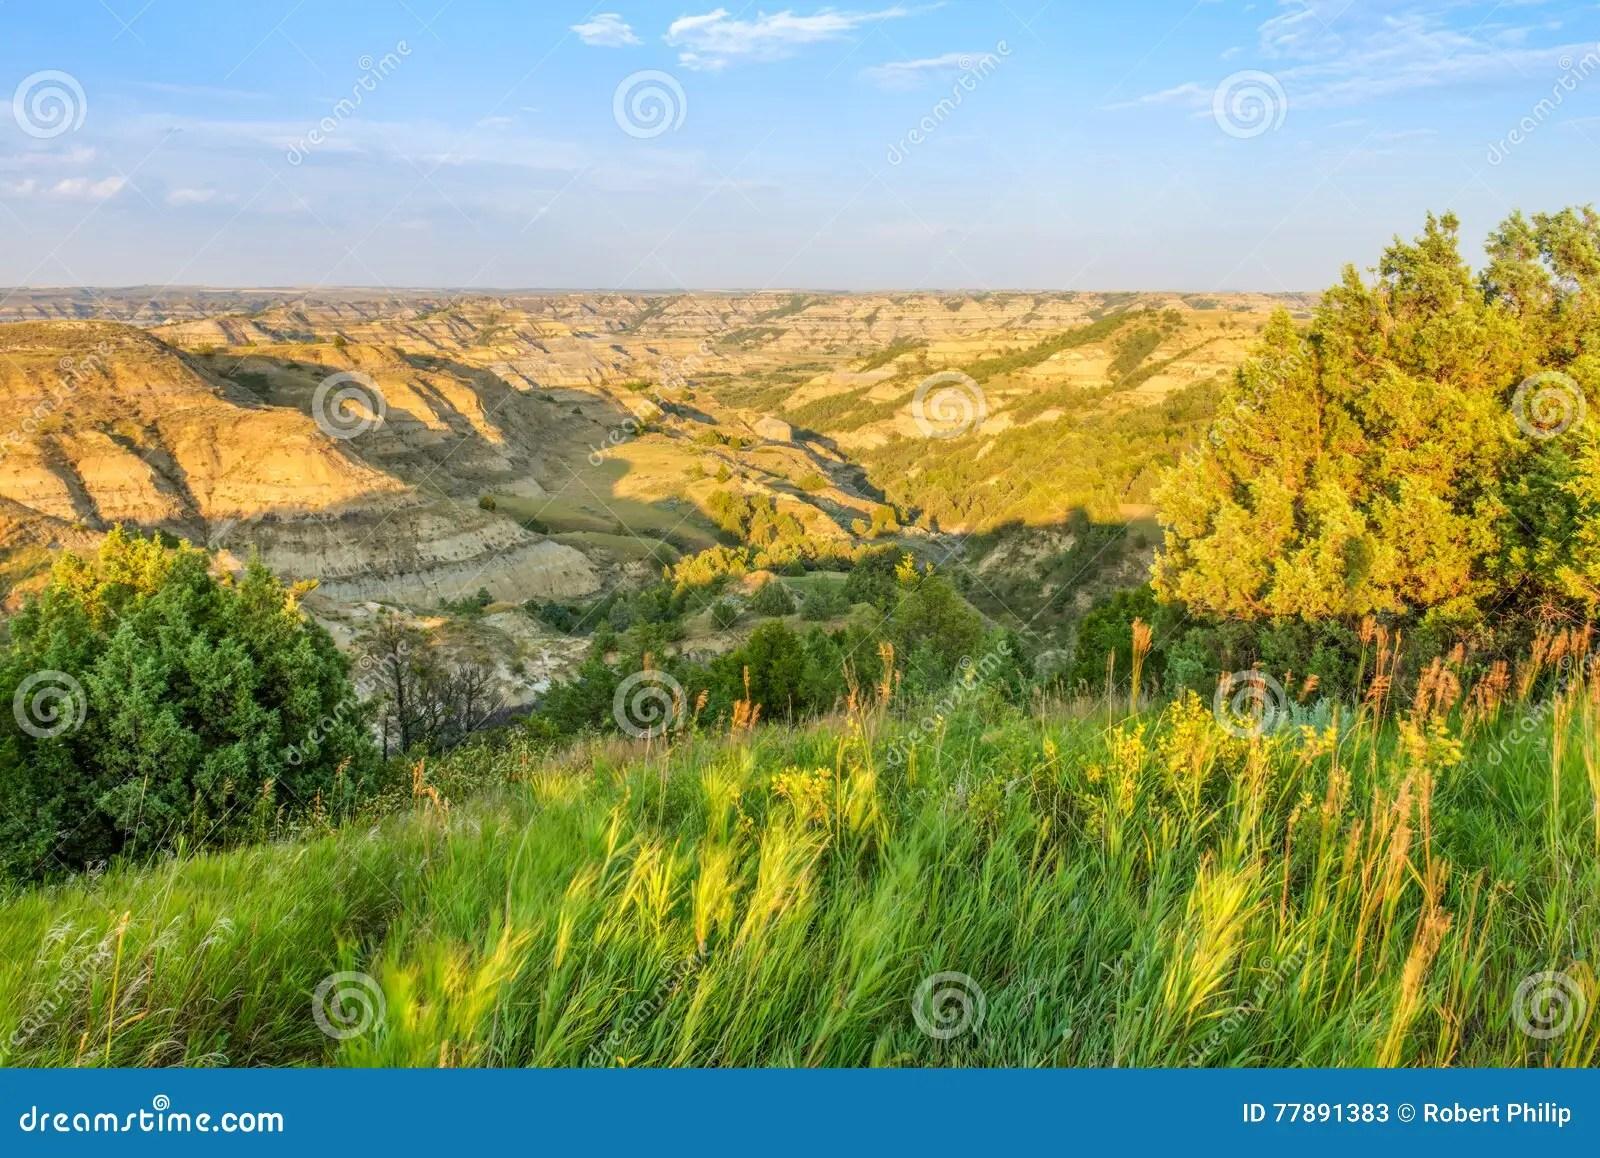 Theodore Roosevelt National Park Stock Image